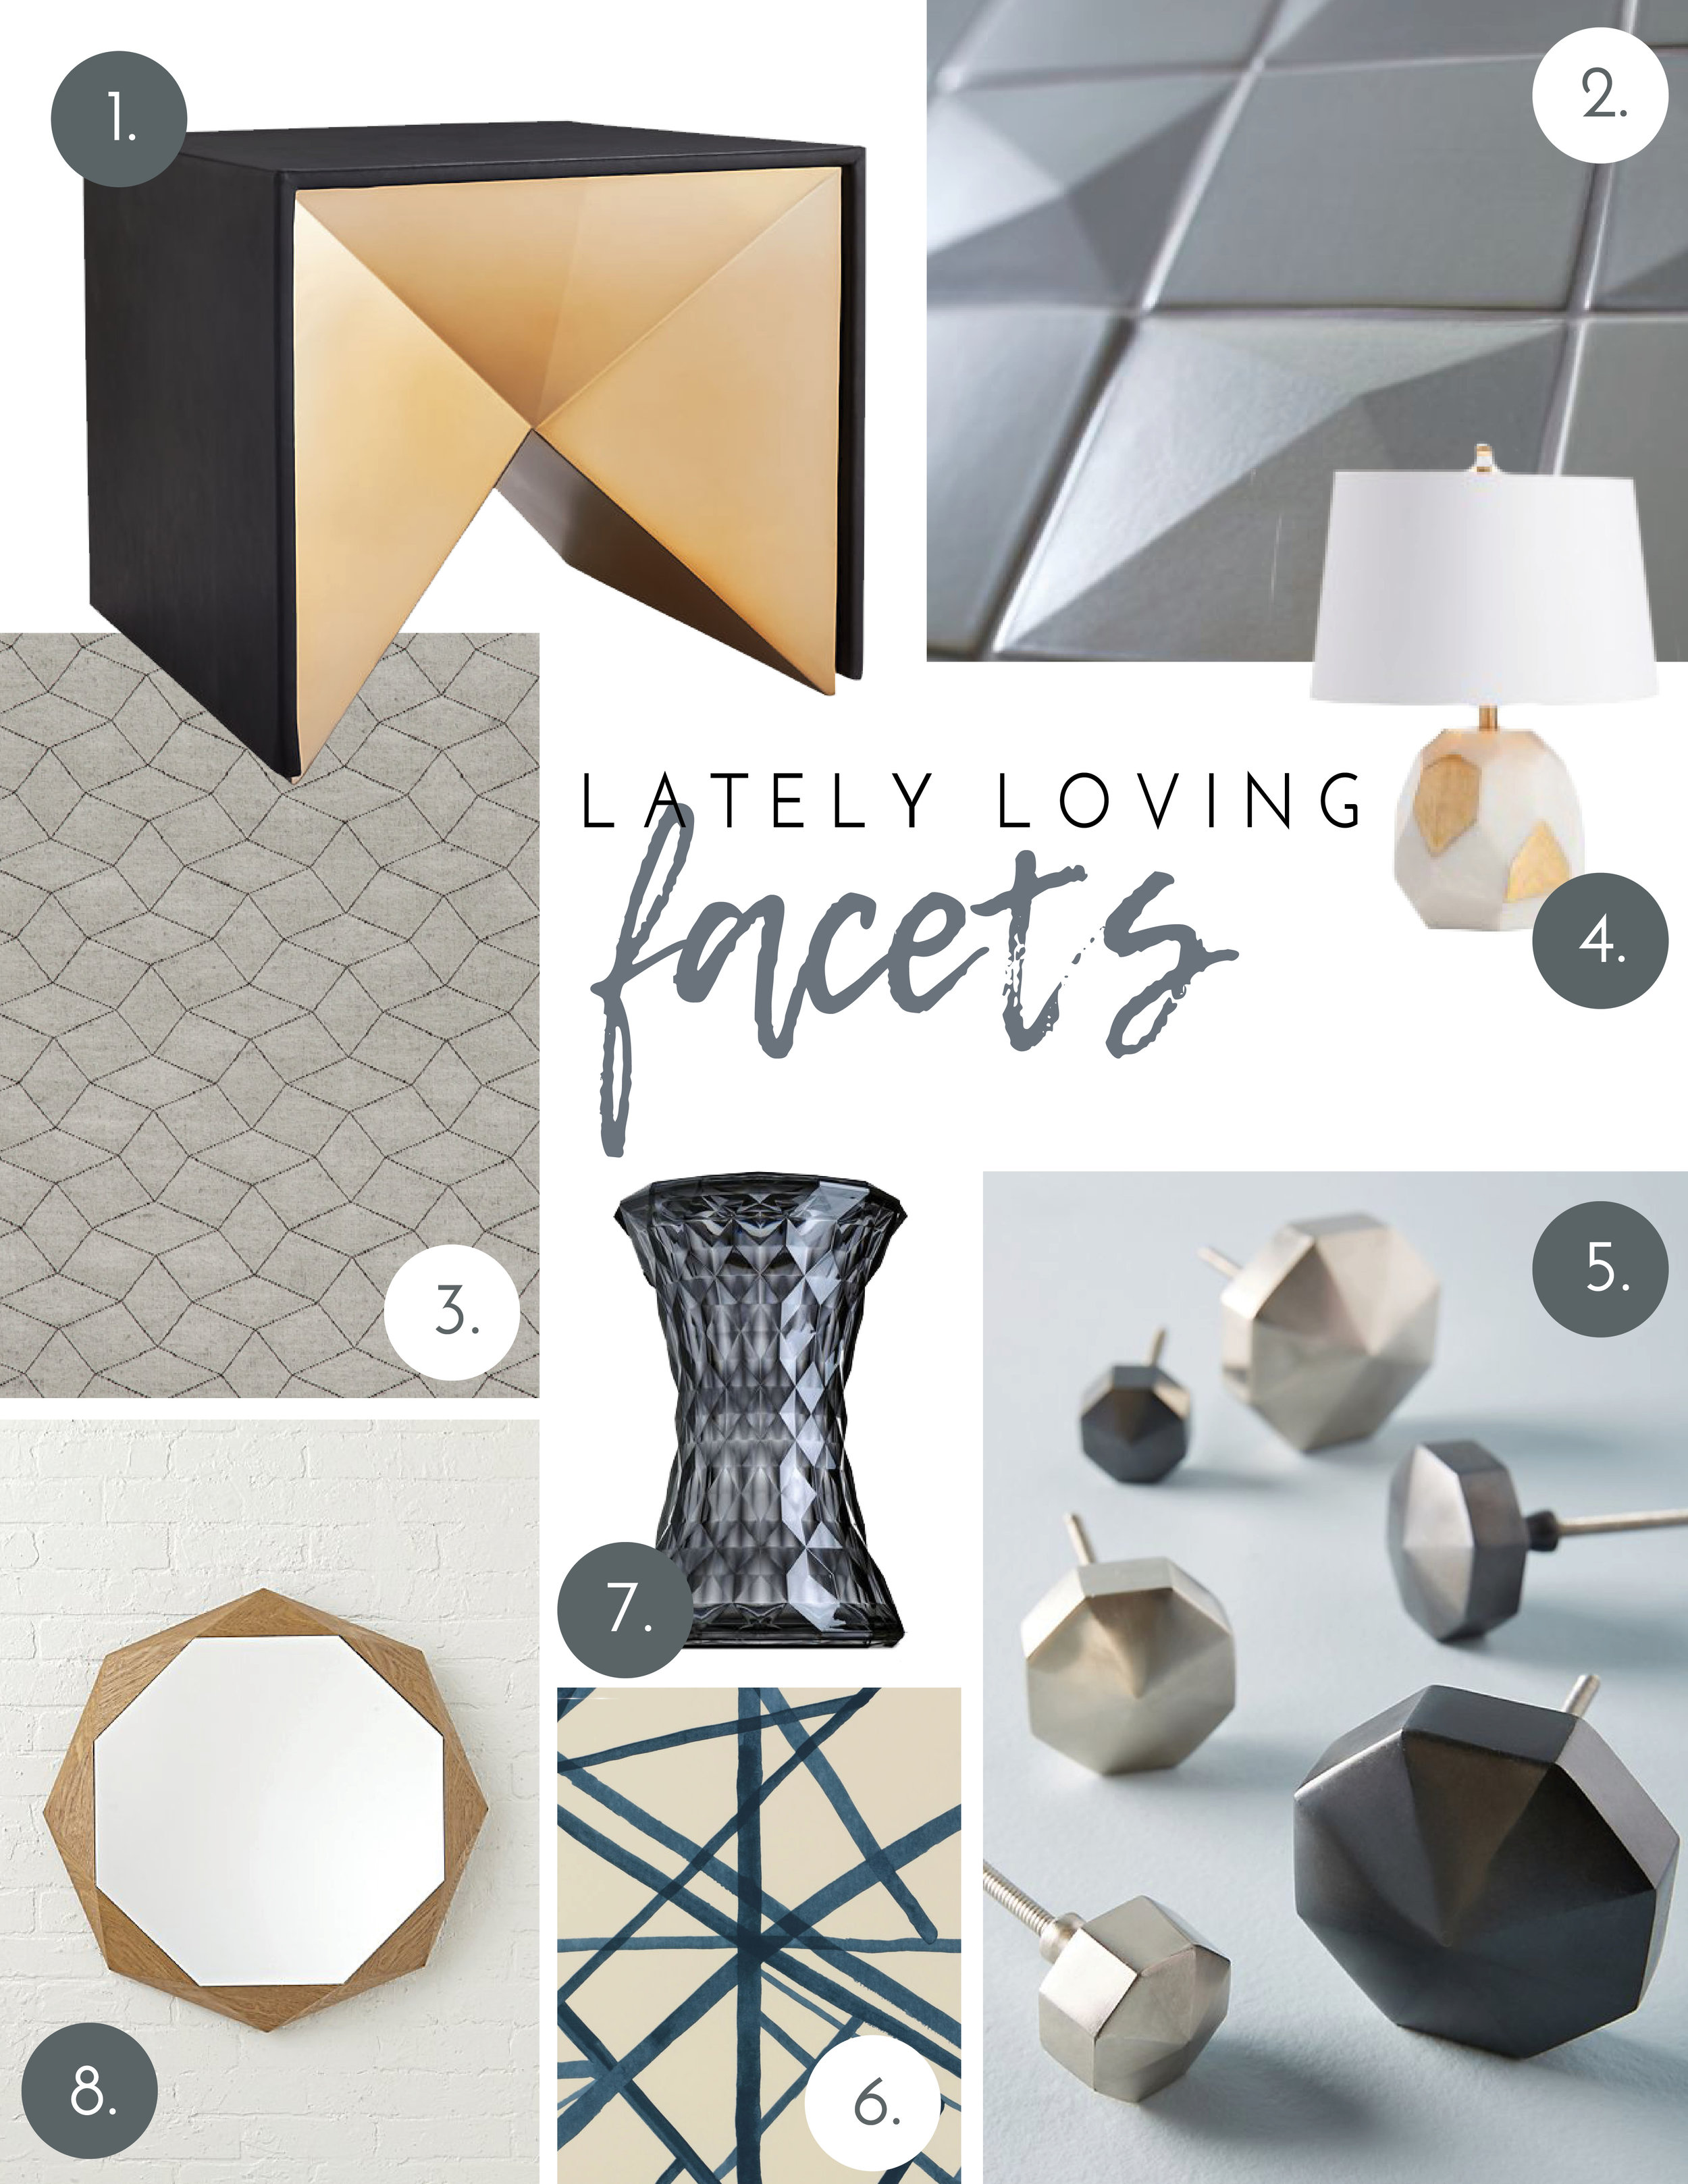 Nyla Free Designs, Calgary Interior Designer, Calgary Interior Design, Facets, Lately Loving, Blog